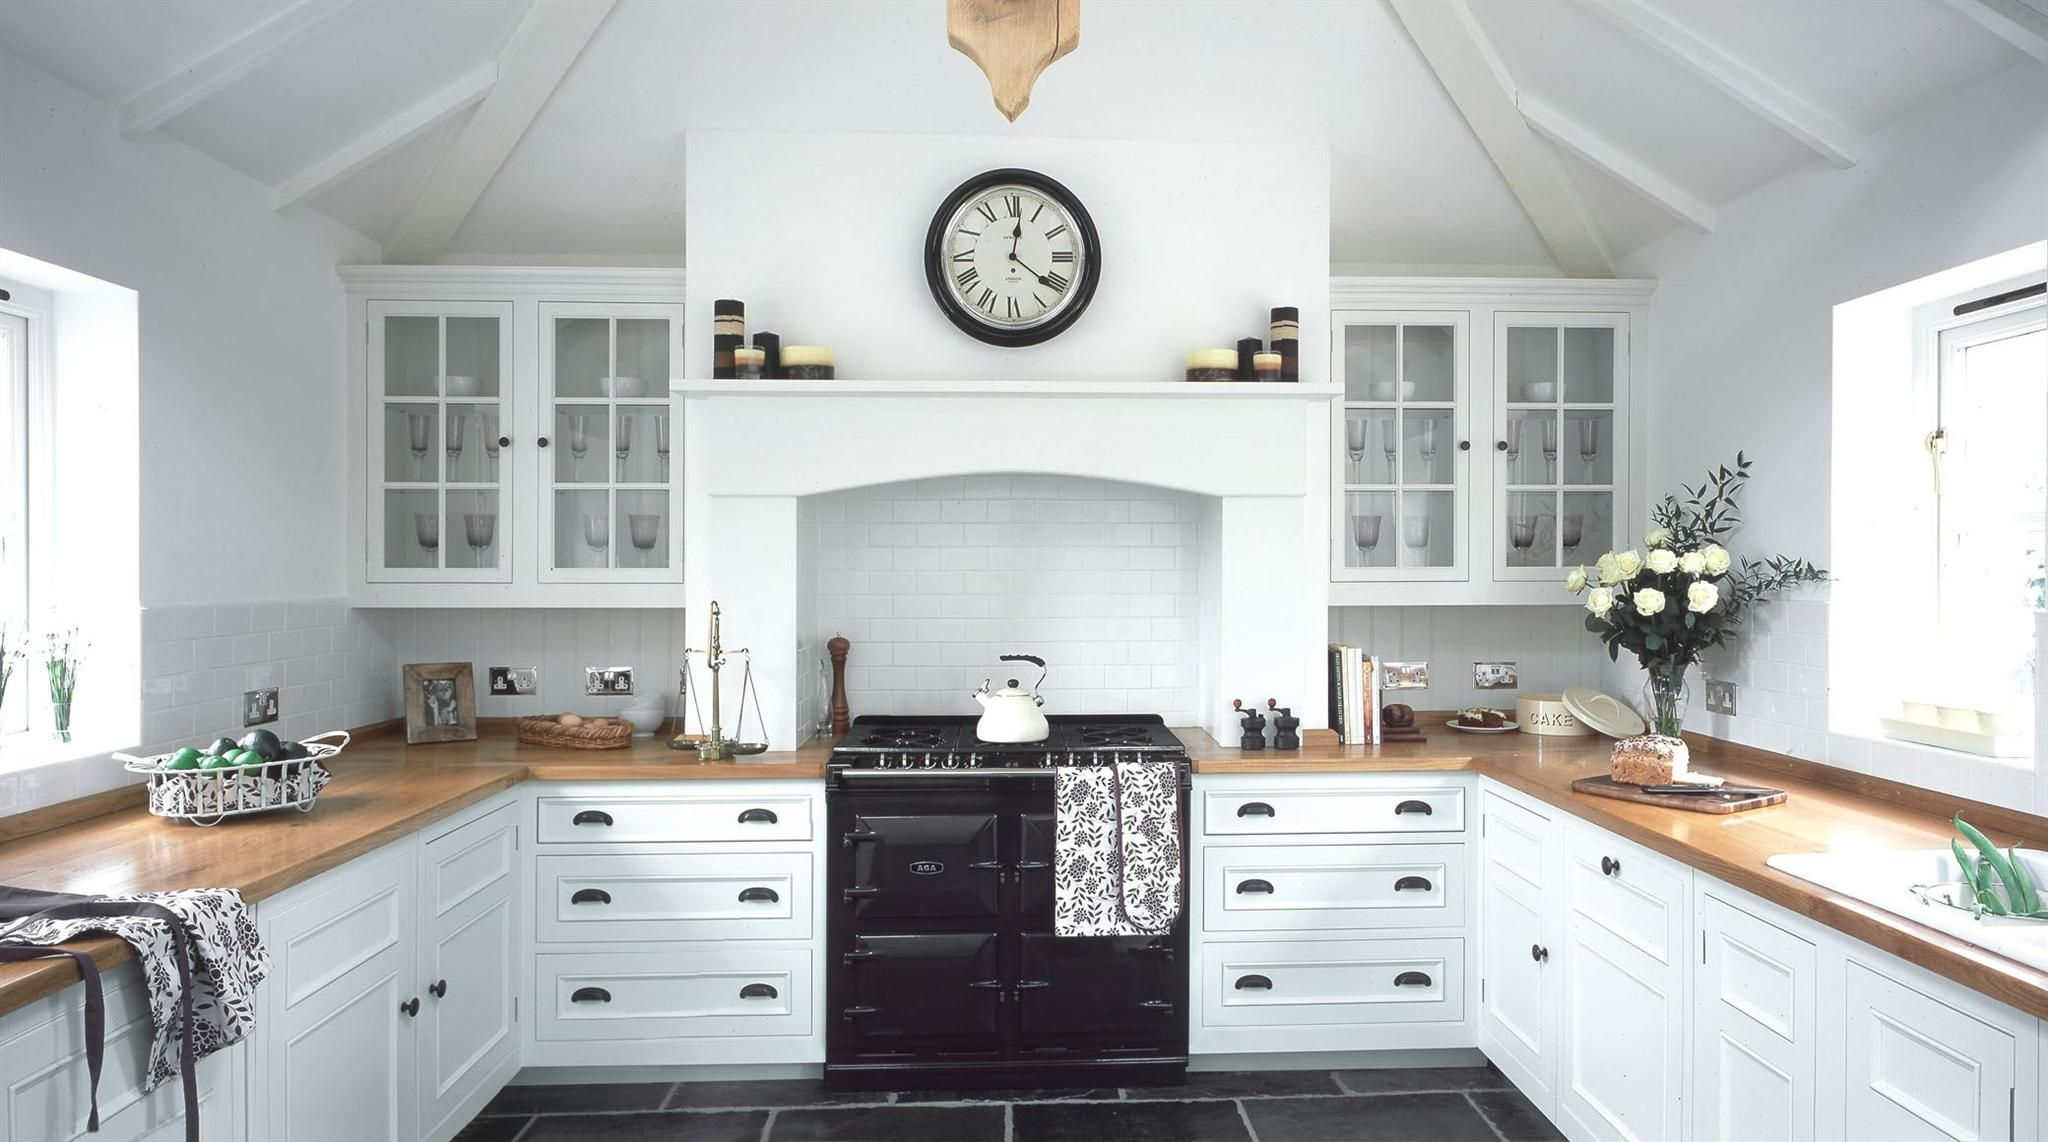 timelessly stylish original kitchen kitchen ideas pinterest #1: 0dcfbf6474381792febd47e9aab72c51 jpg